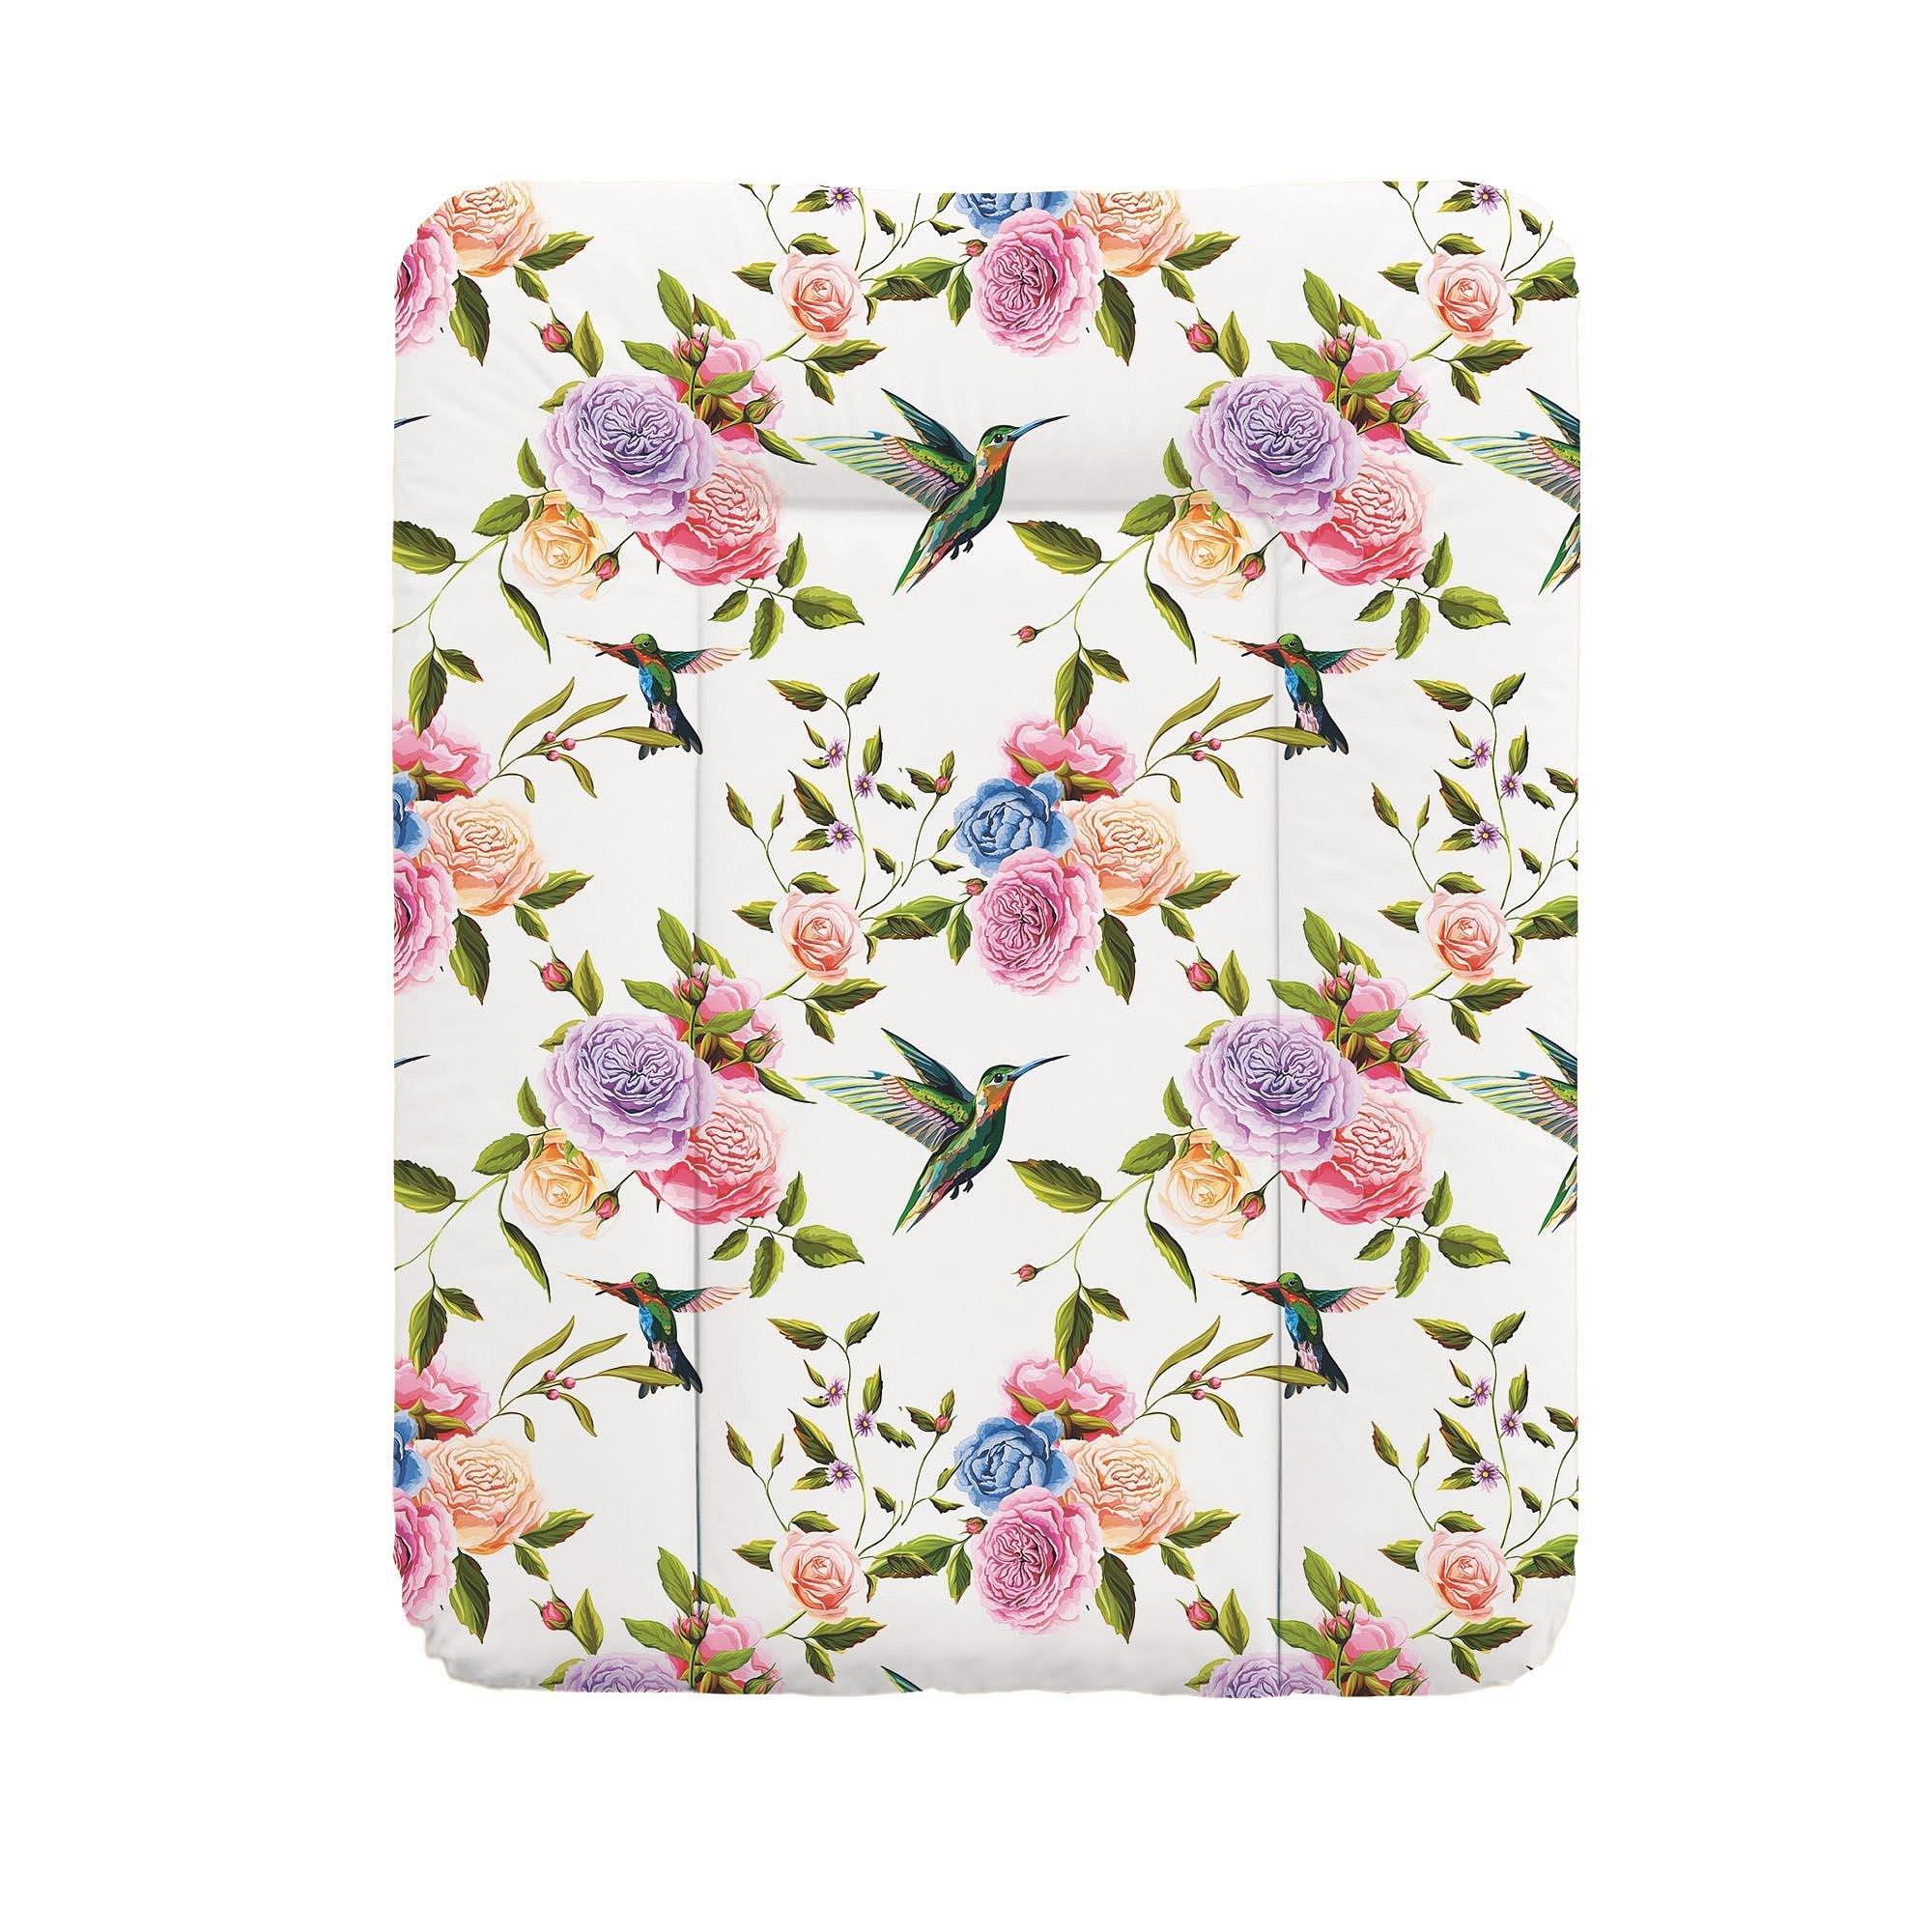 CEBA Podložka přebalovací na komodu 50 x 70 cm Flora & Fauna Flores